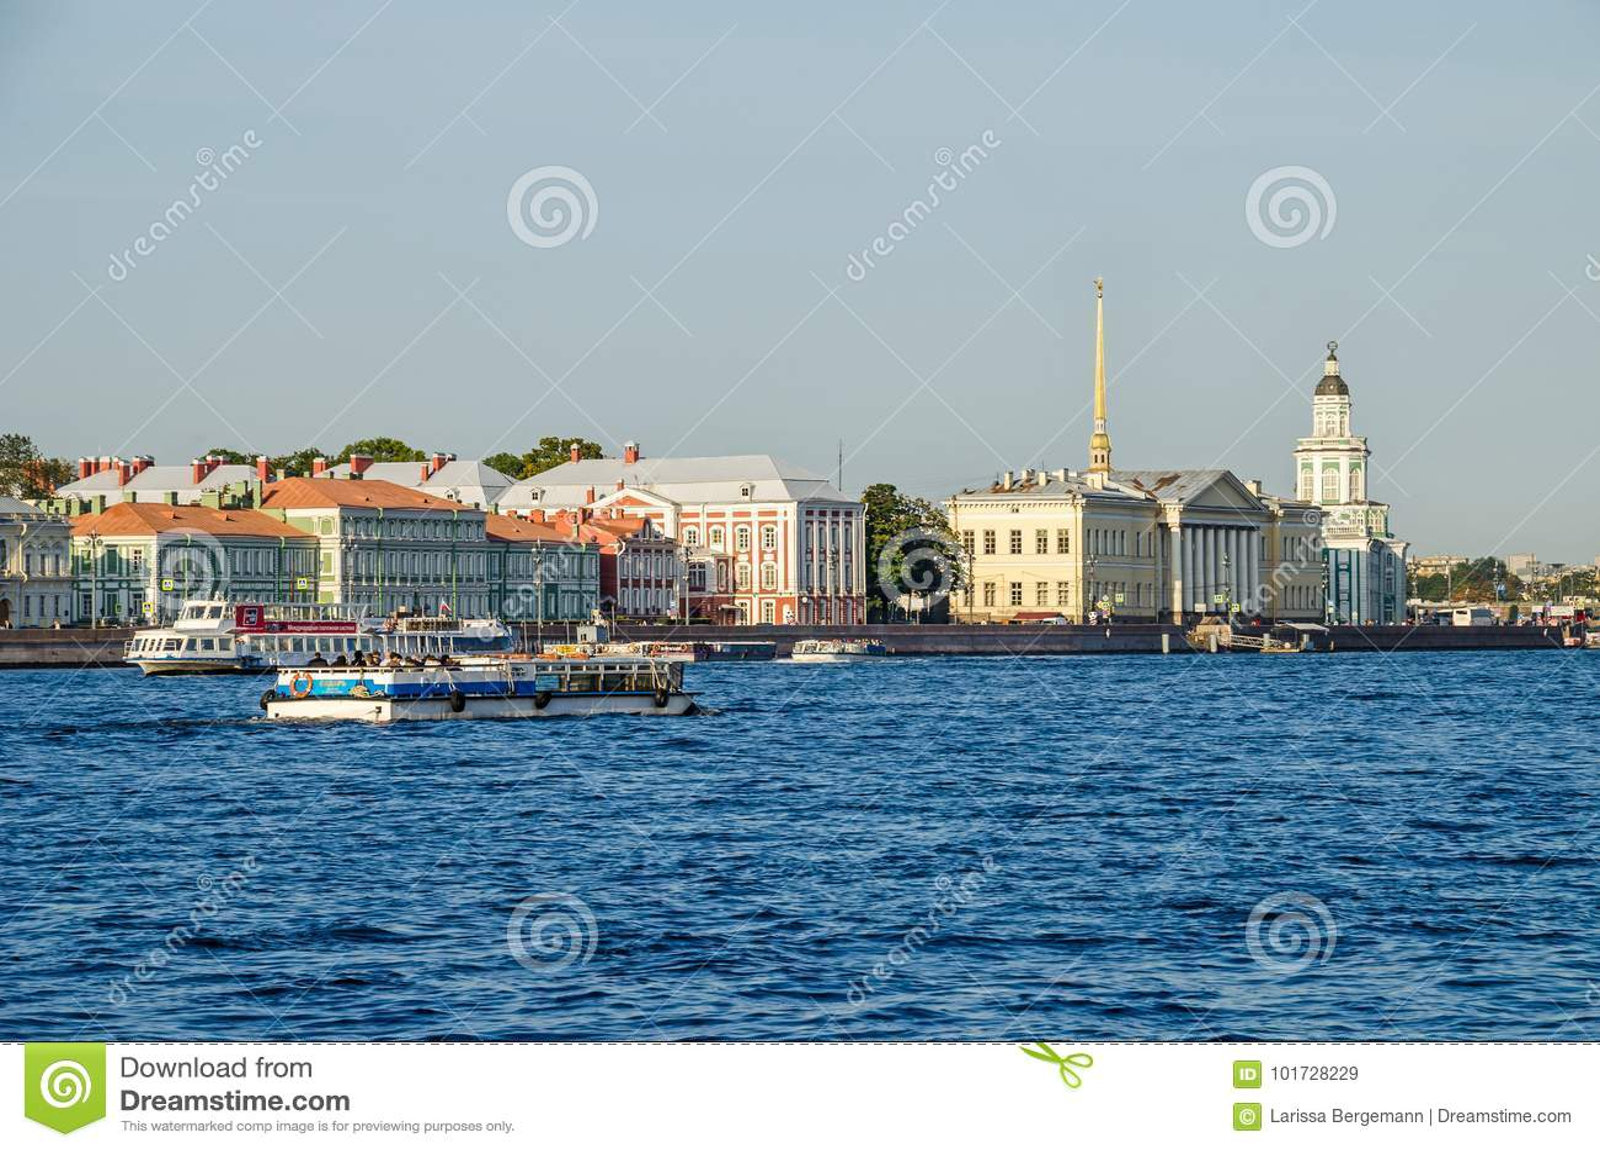 Overview of swimming pools on Vasilyevsky Island in St. Petersburg 83